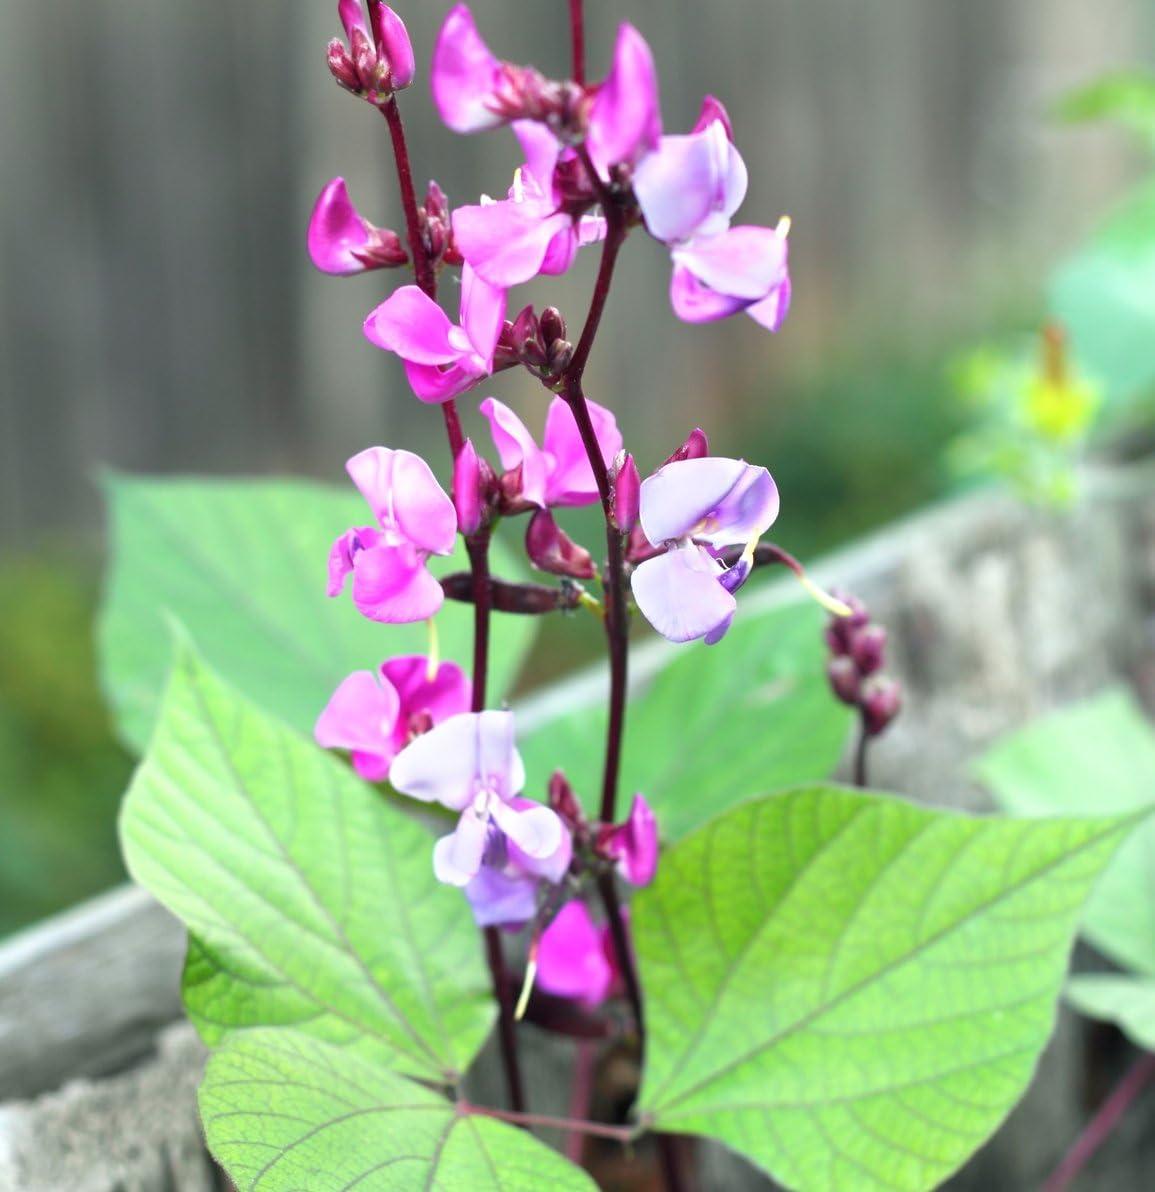 Hyacinth Dolichos Lablab Hyacintovie Beans fragant Seeds Flowers from Ukraine 1 Gram